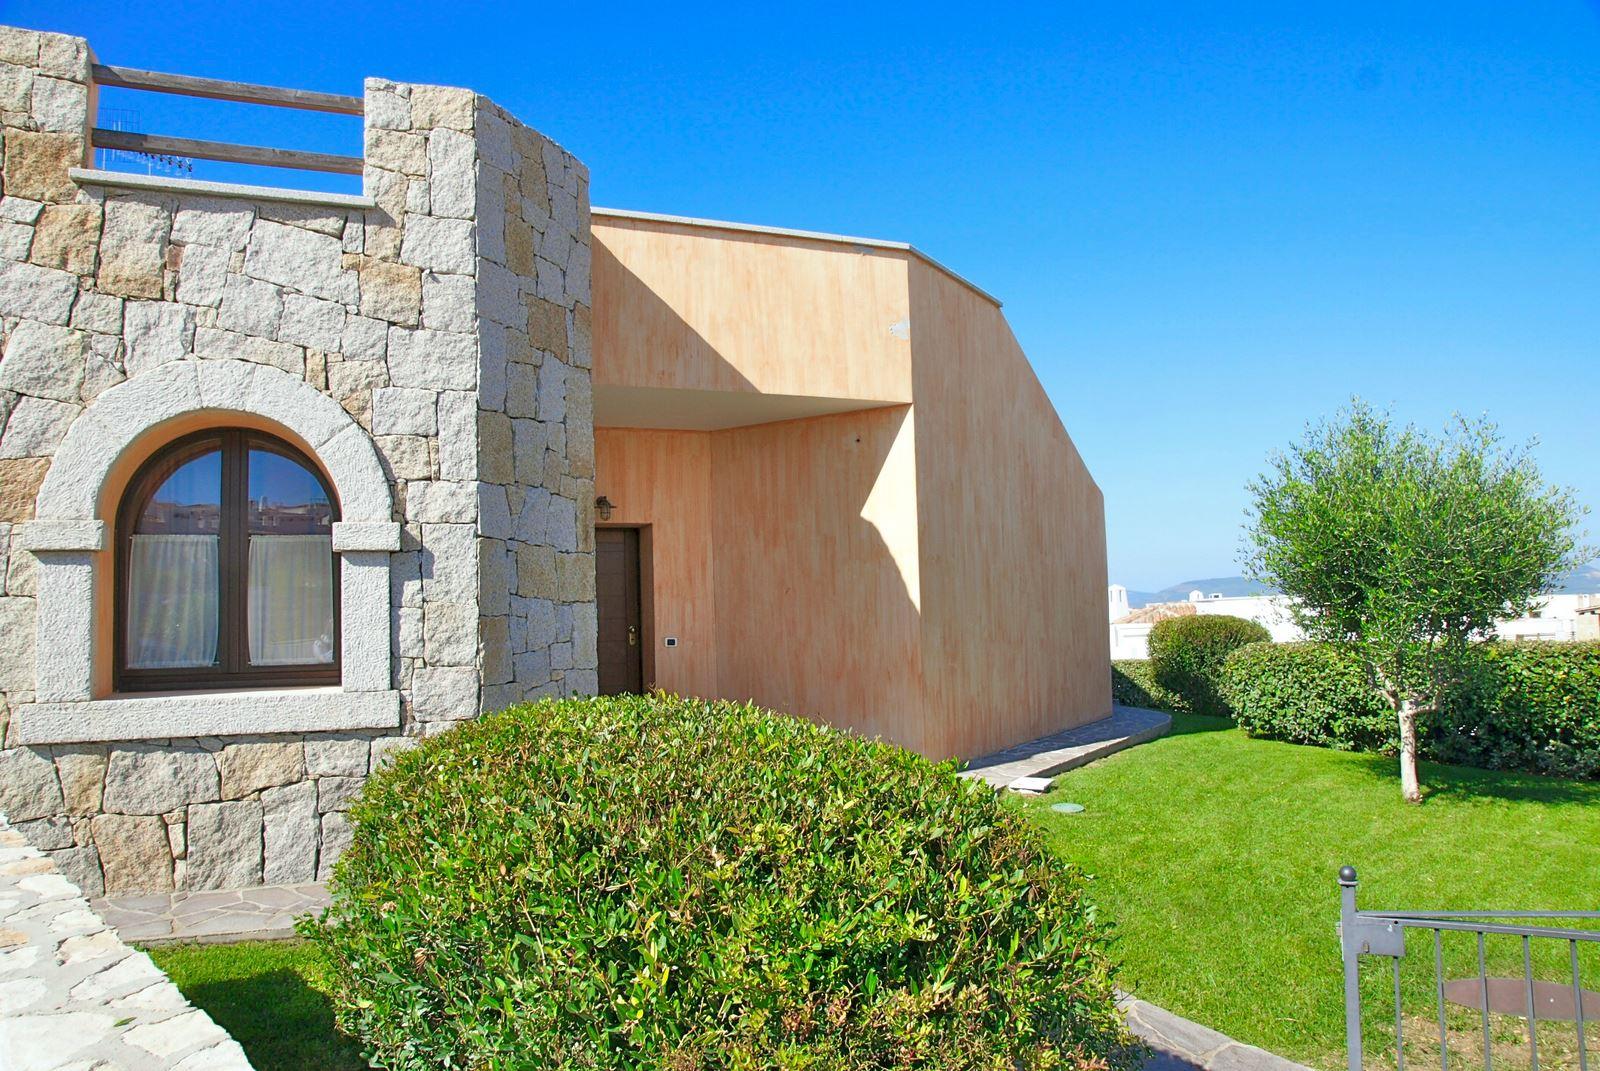 Ferienhaus Carru (877335), Sant Angelo Custode, Sassari, Sardinien, Italien, Bild 8